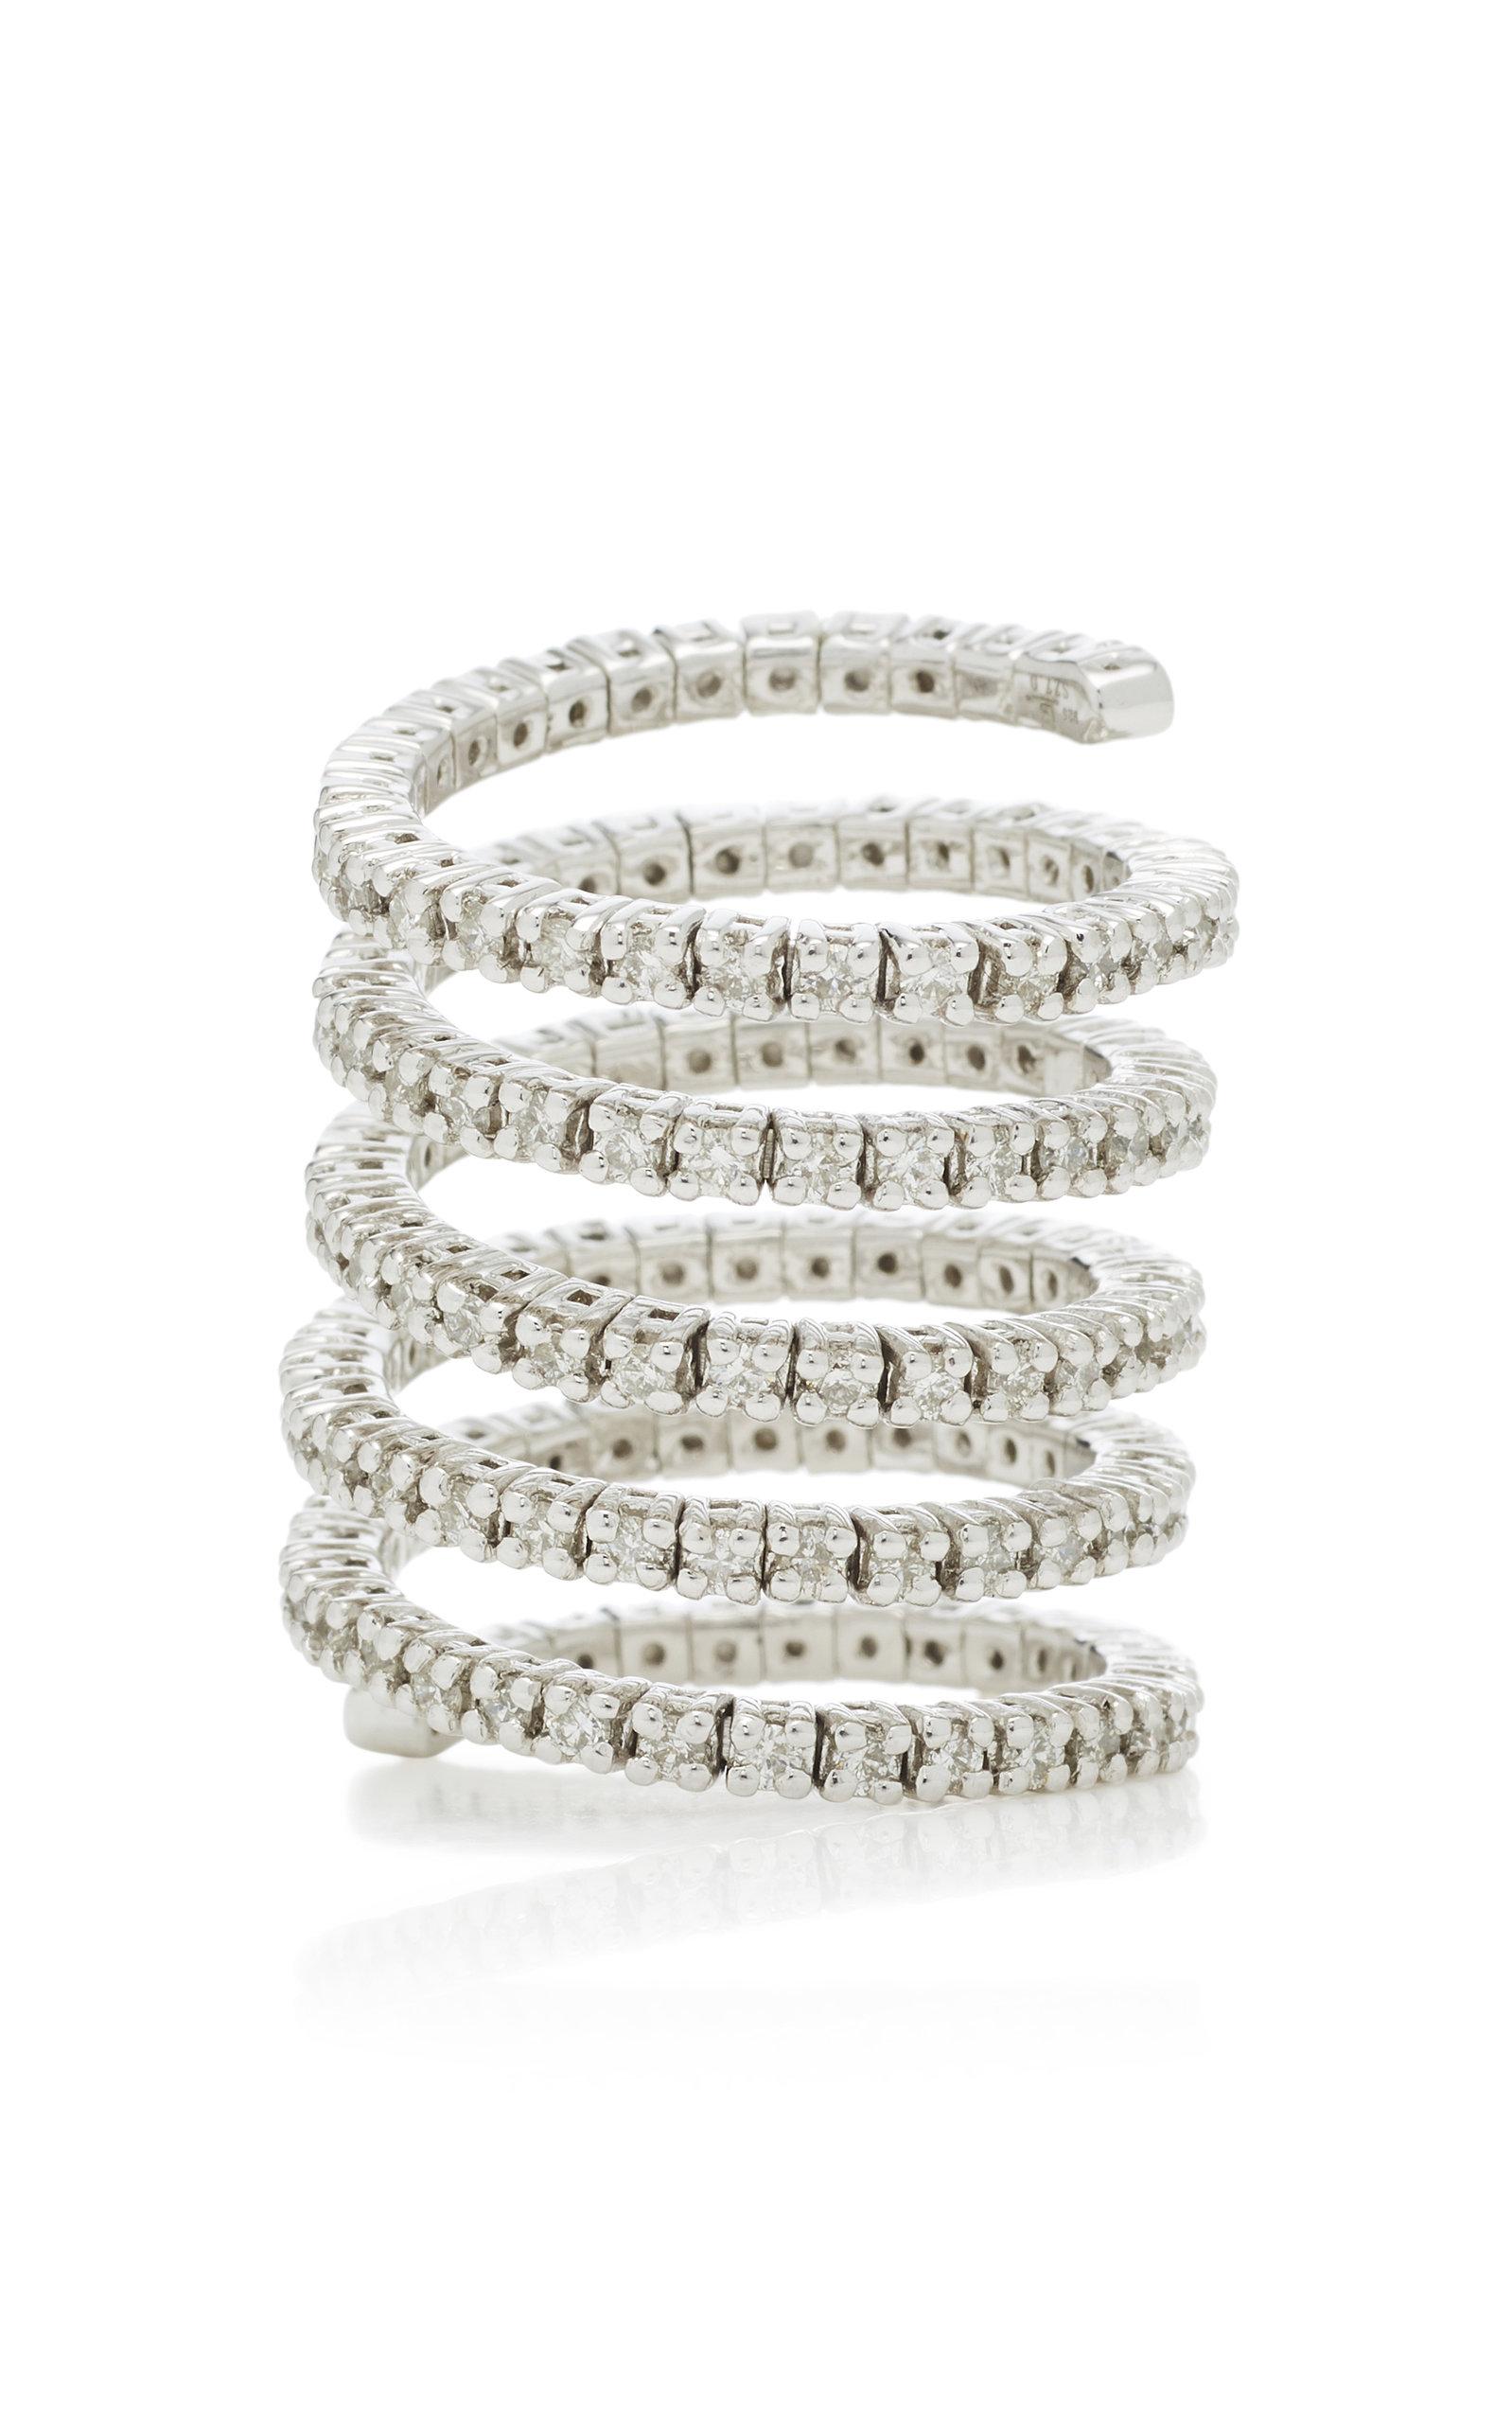 LYNN BAN JEWELRY Vortex Diamond Ring in Silver